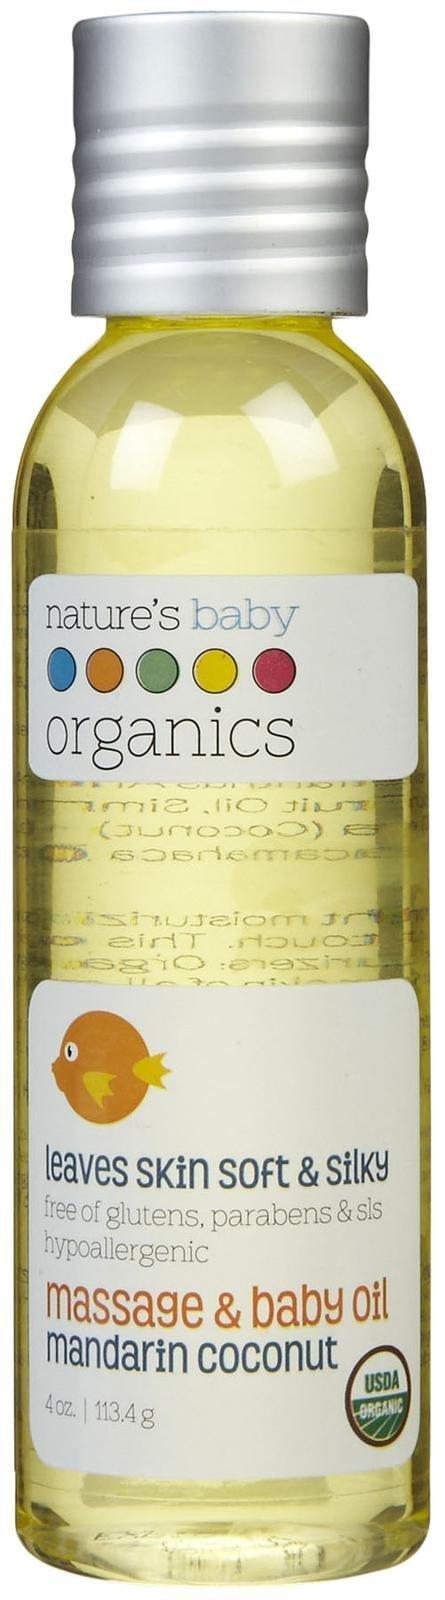 NBO Baby Oil - Mandarin/Coconut - USDA-95% Organic - 4 oz by Nature's Baby Organics